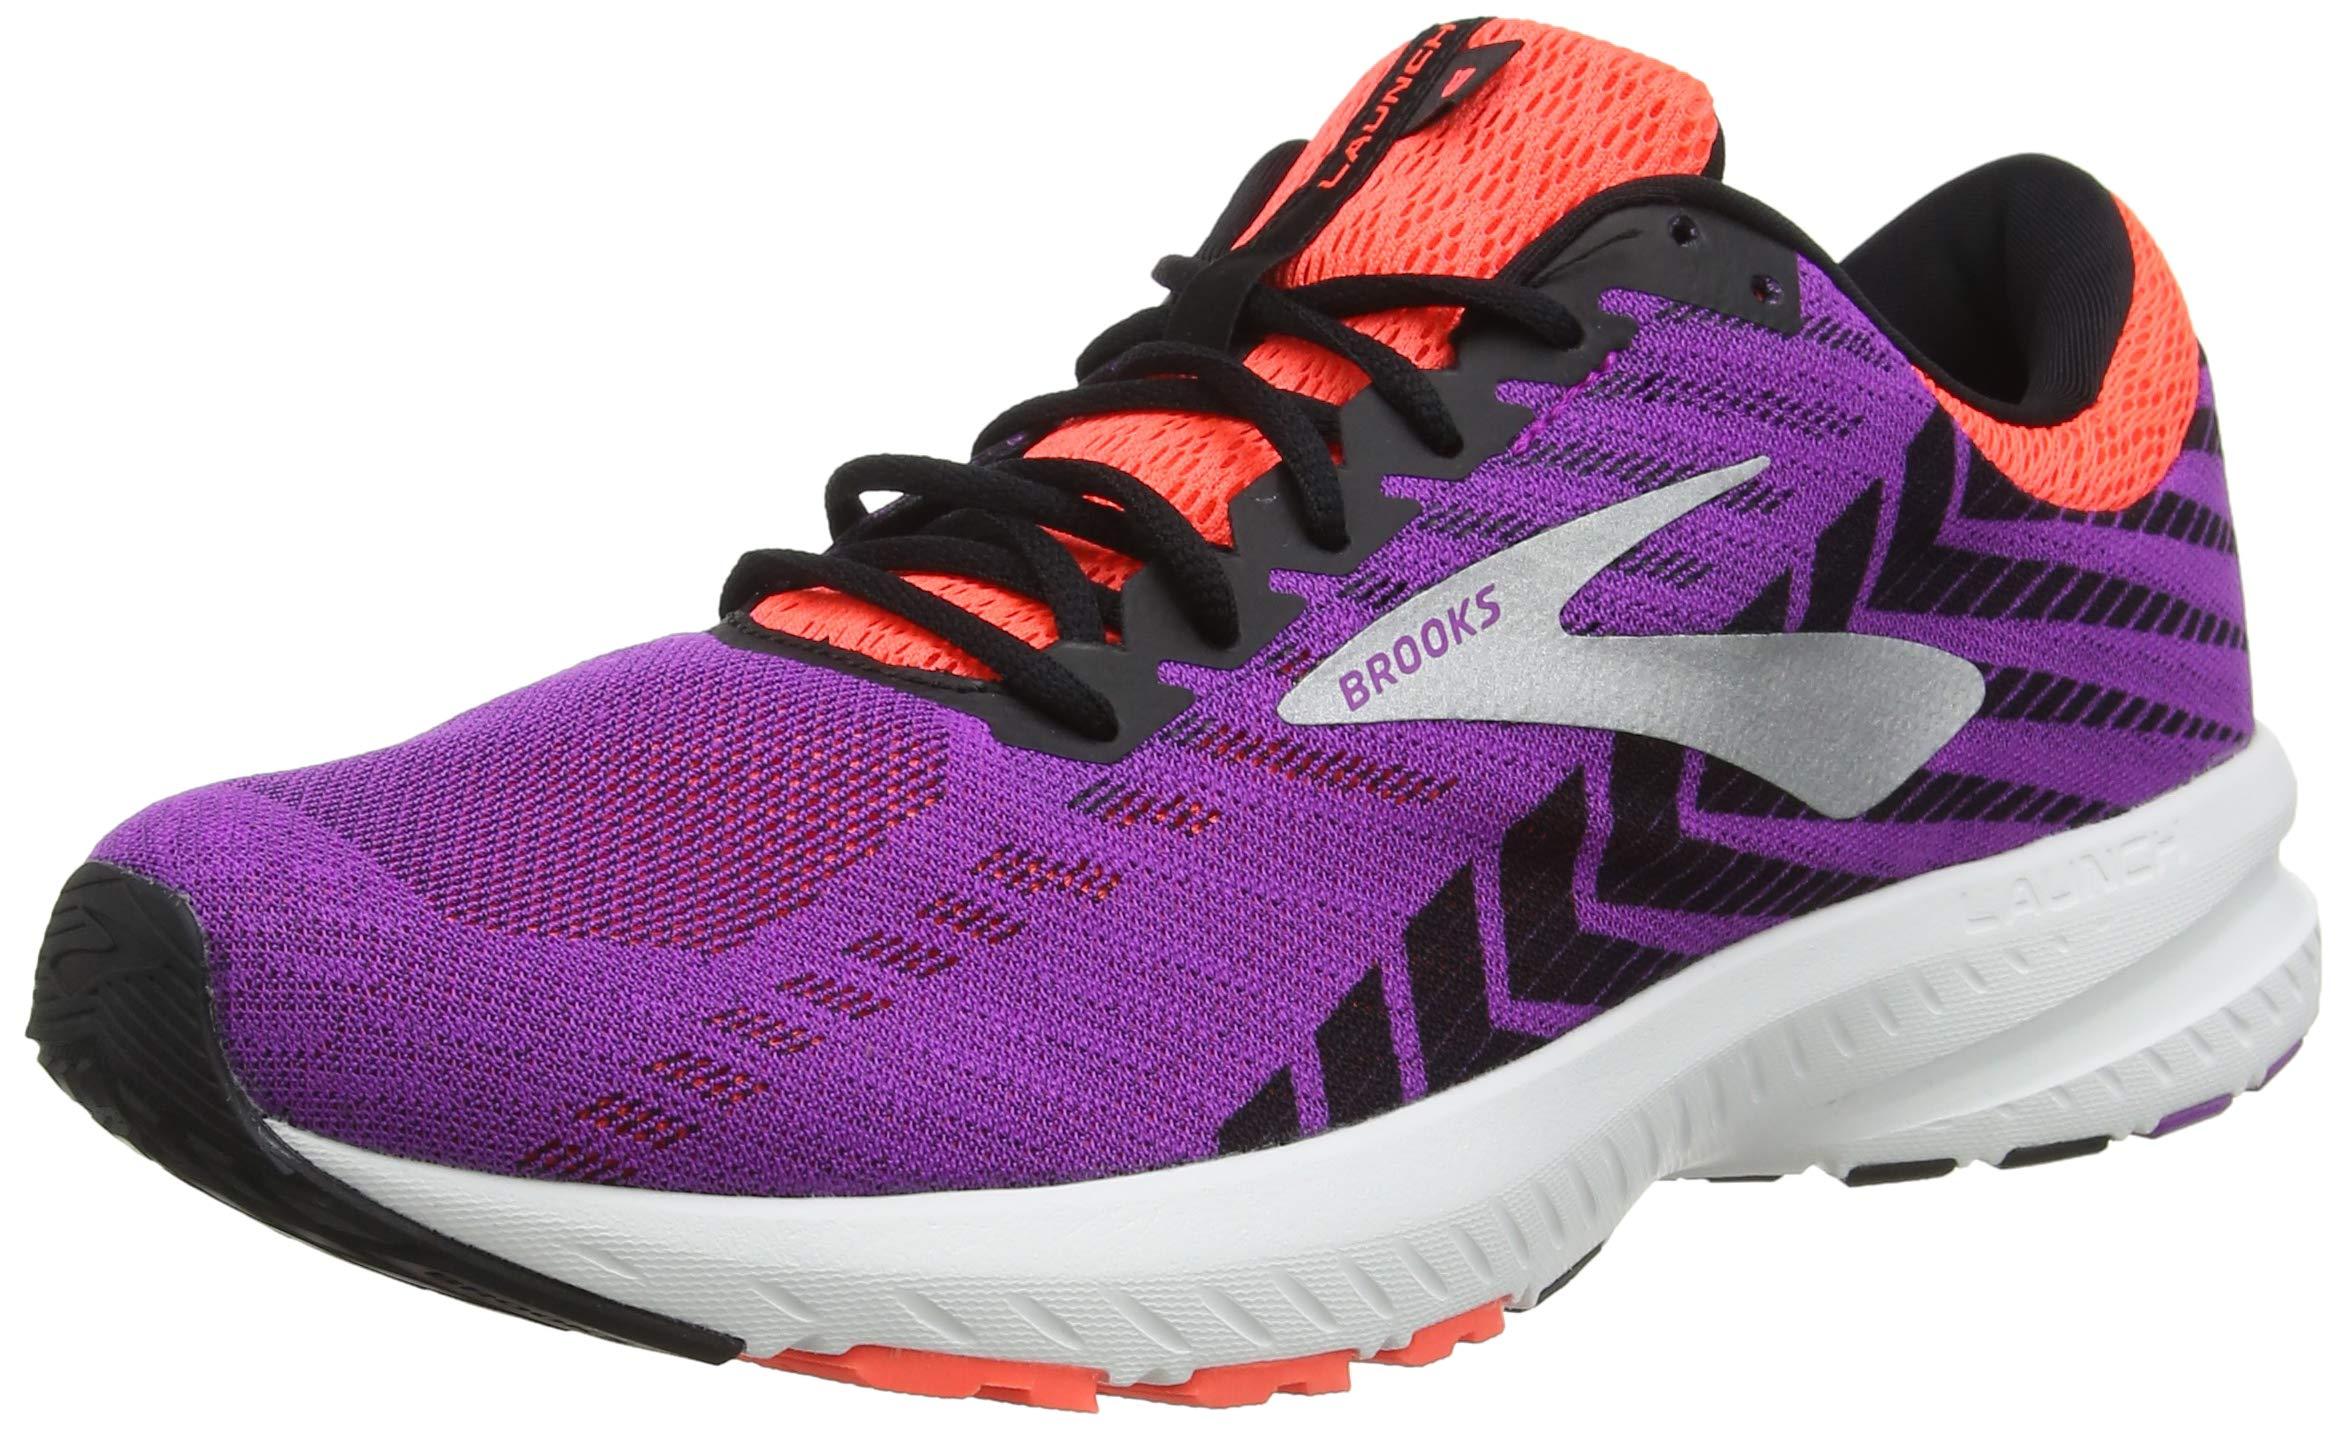 81ggY%2Bvi7TL - Brooks Women's Launch 6 Running Shoes